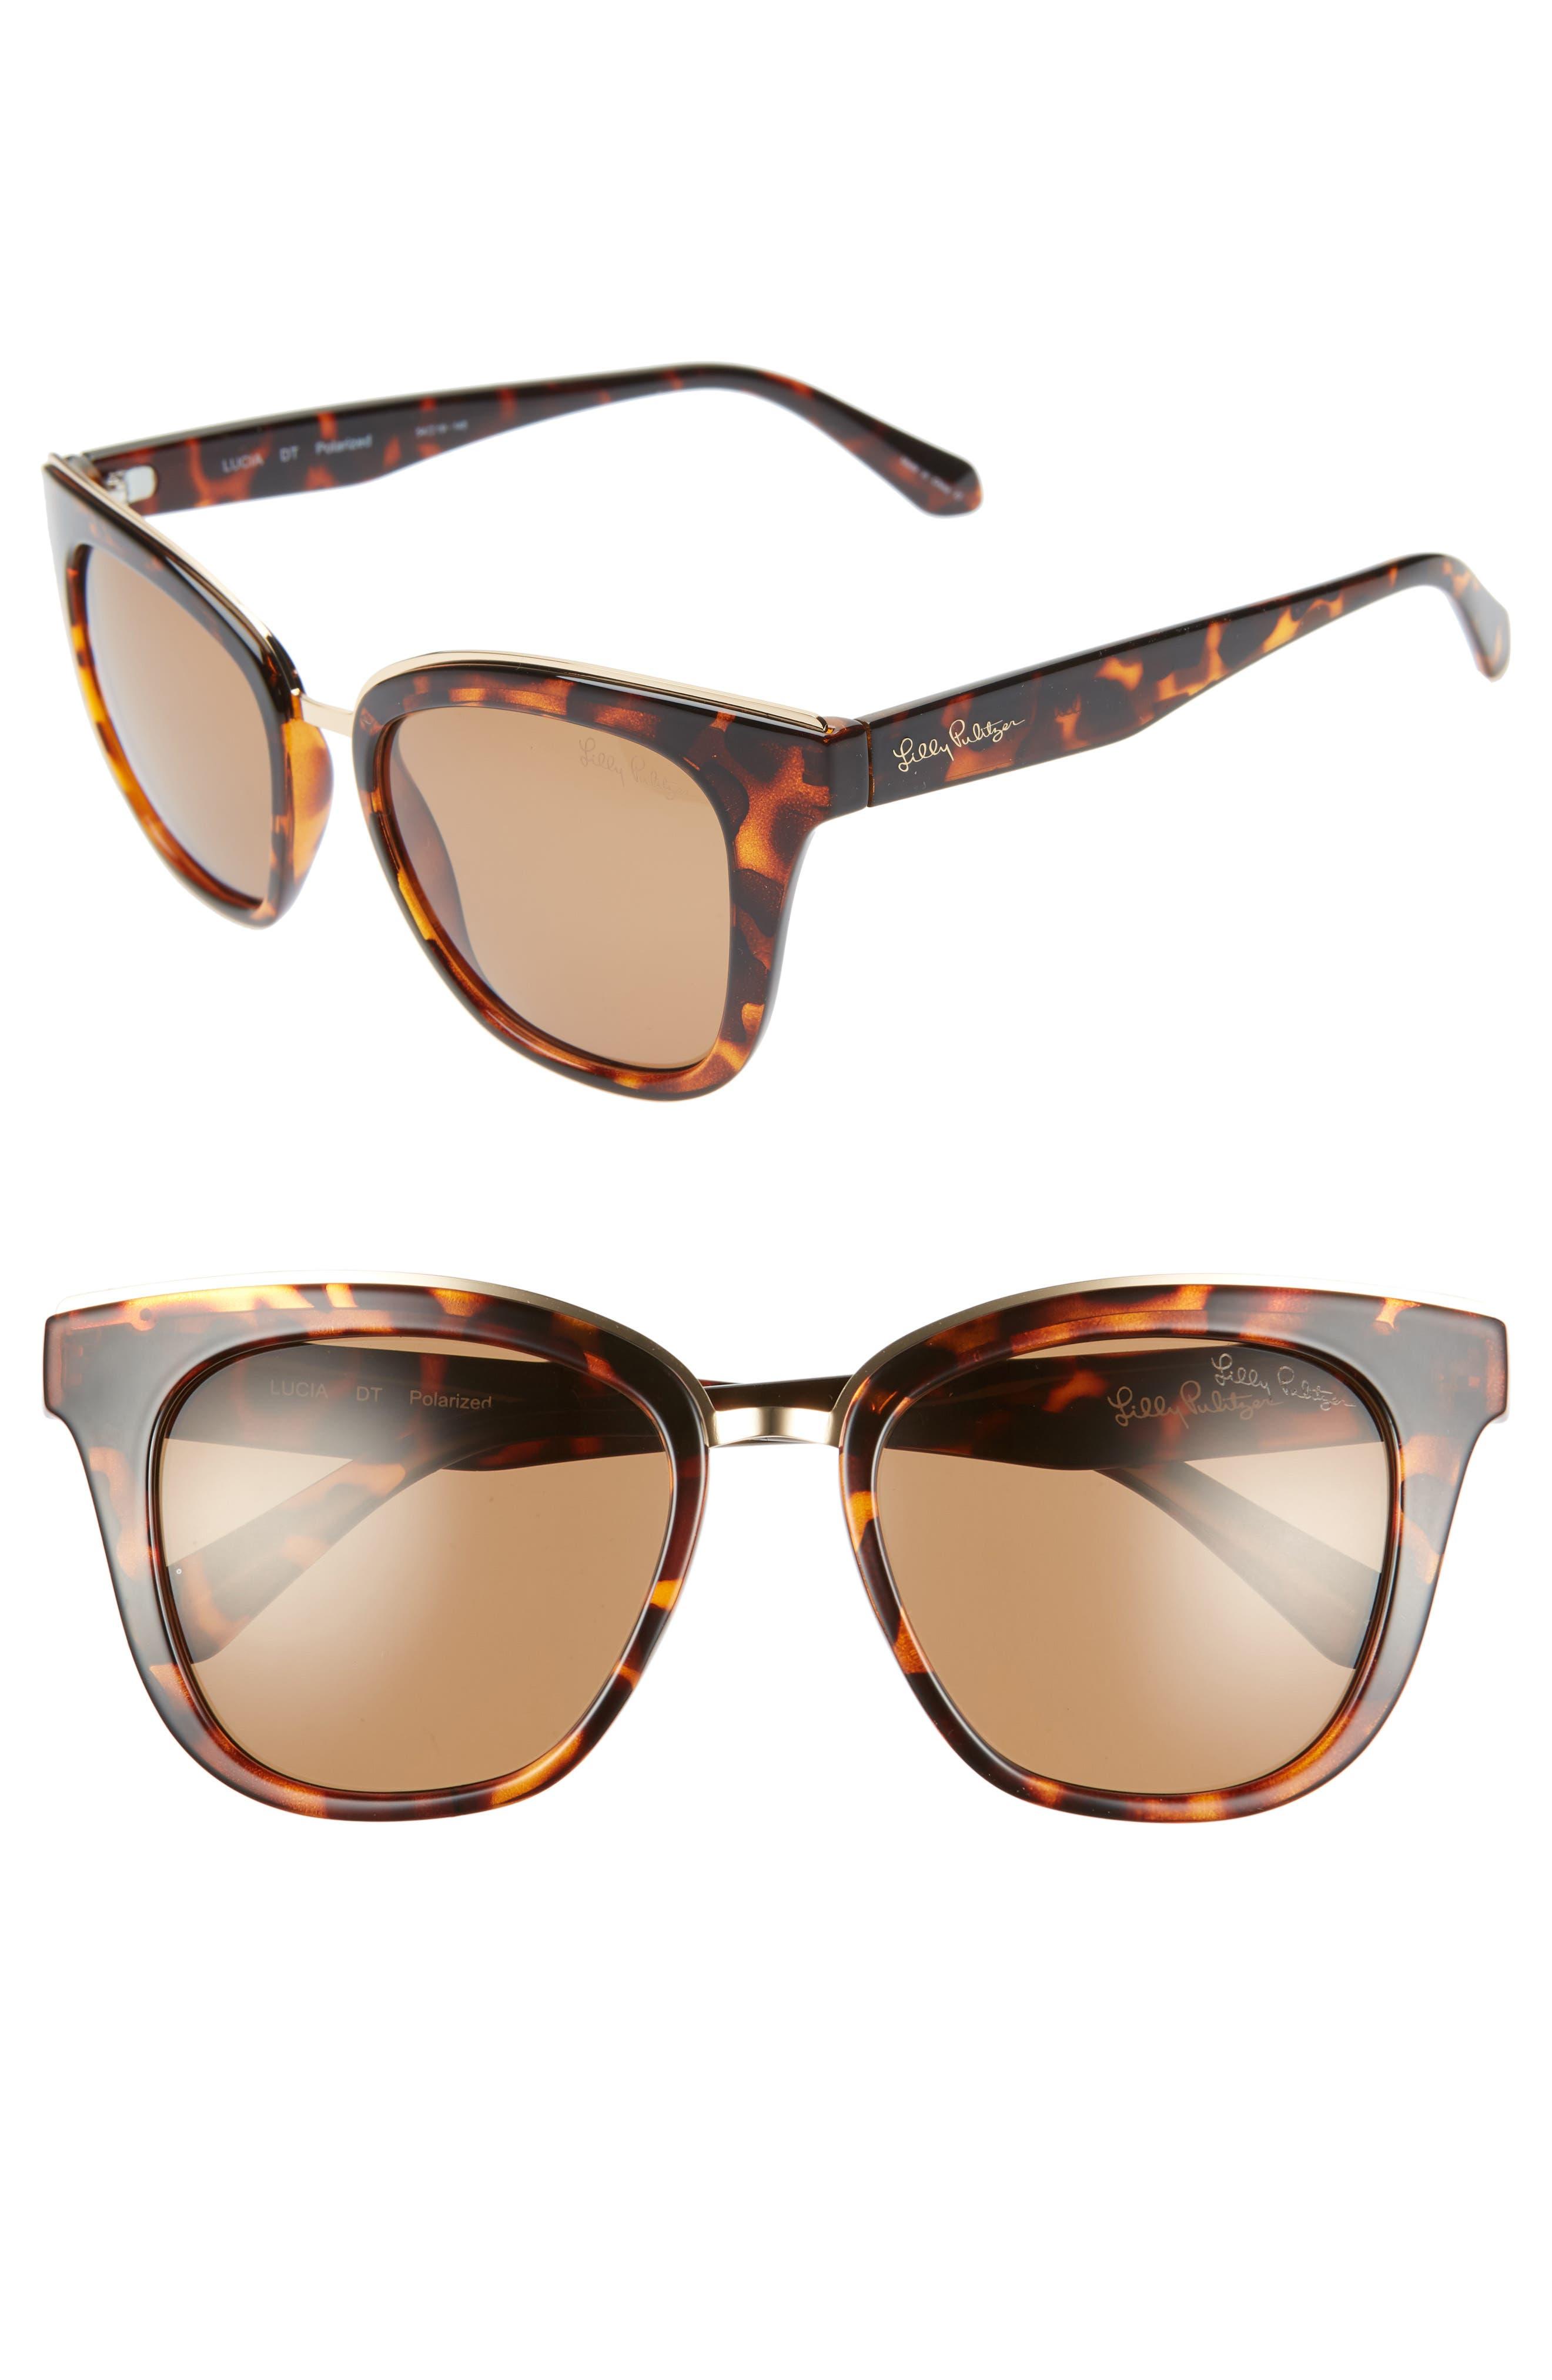 Lilly Pulitzer Lucia 5m Cat Eye Sunglasses - Dark Tortoise/ Gold Mirror